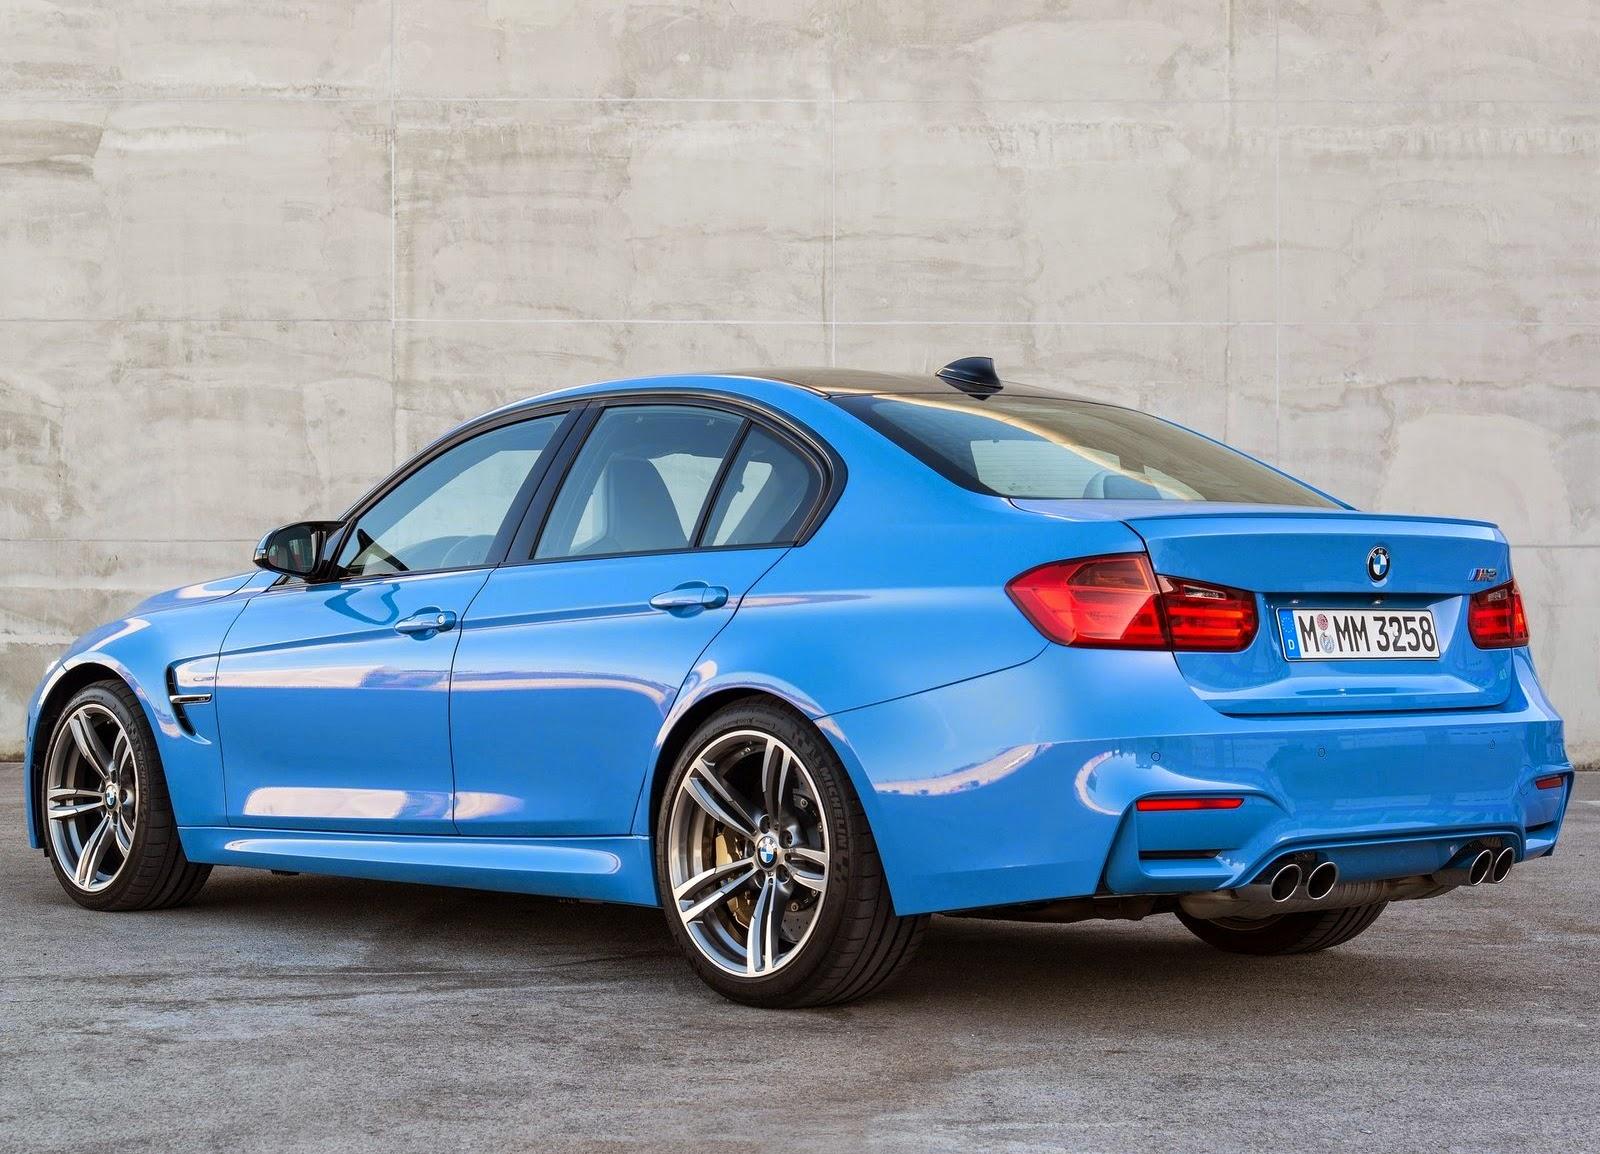 BMW M3 Sedan Blue 2015 Car Wallpaper ! Car Wallpaper HD